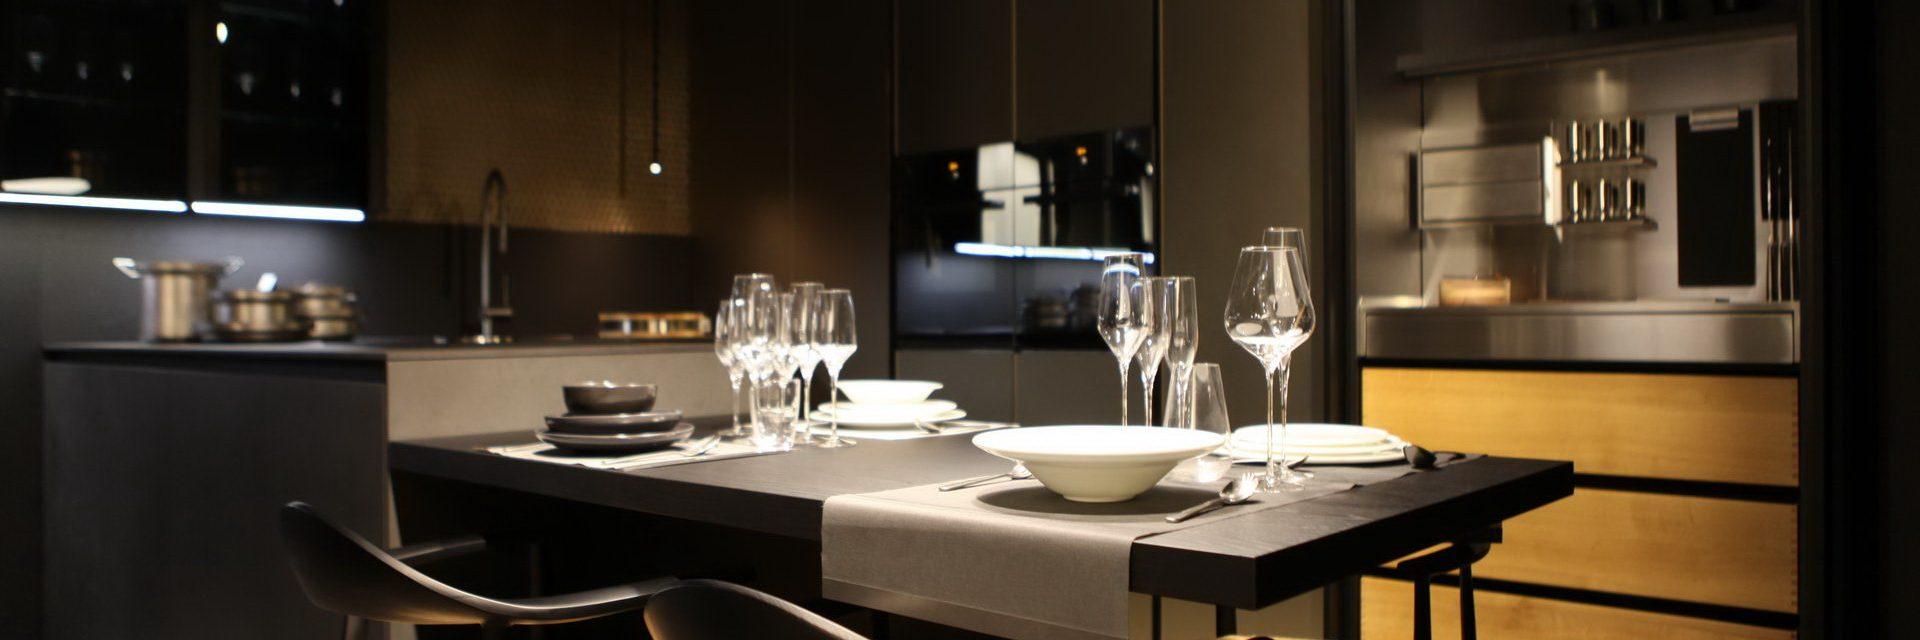 Binova Milano - Via Durini - Cucine Moderne di Design Made in Italy